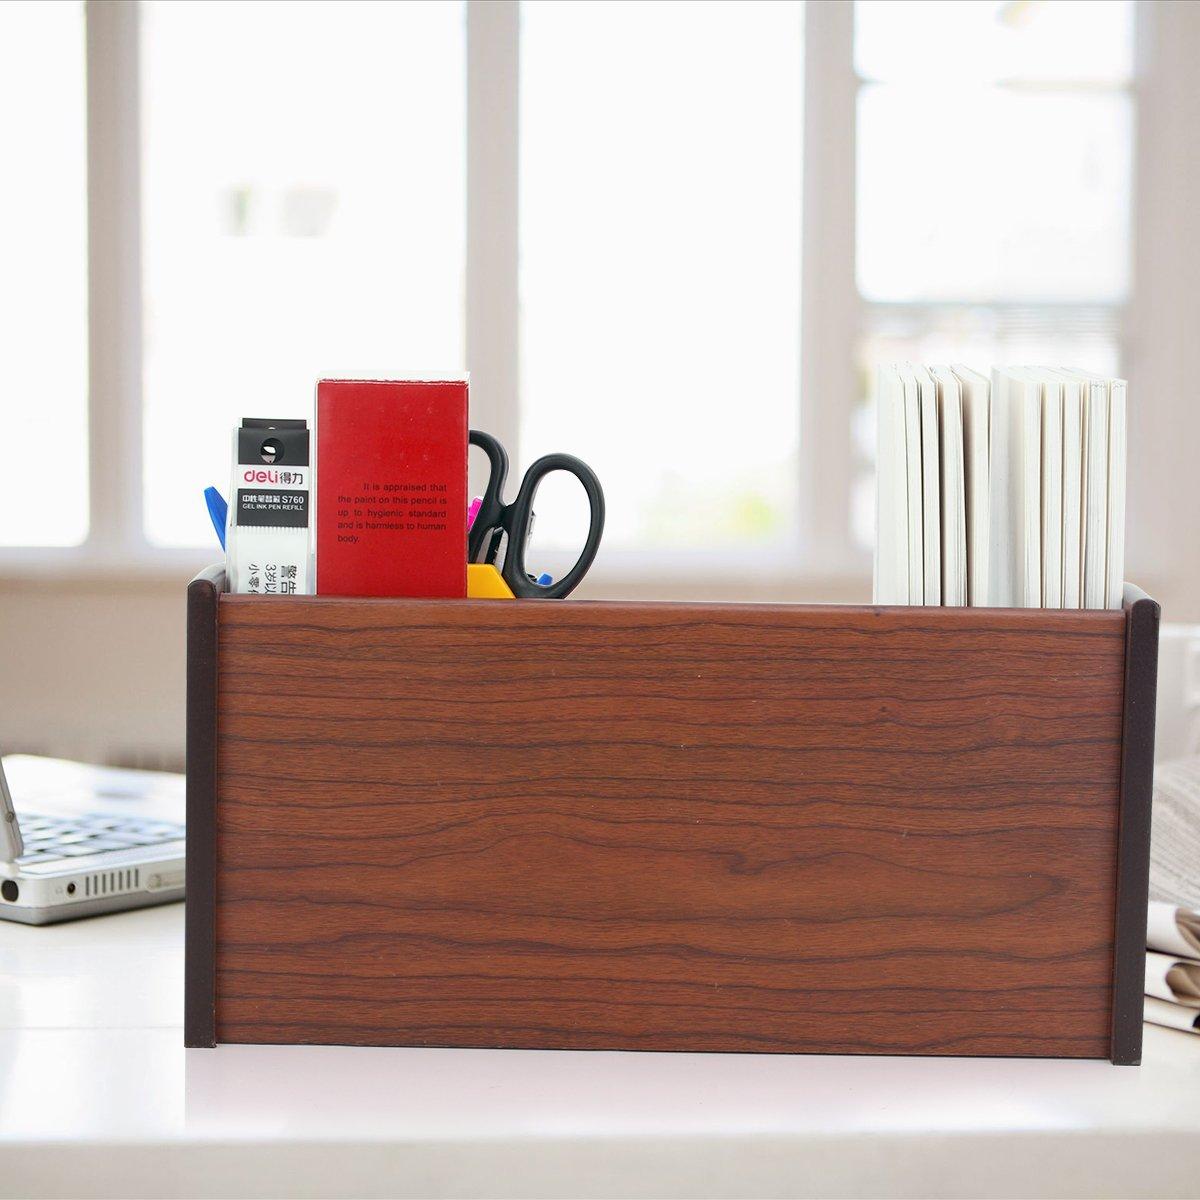 AZDENT Wooden Office Desk Organizer Mail Racks Pen Pencil Holder with 2 Drawers Shelves Desktop Counter Remote Holder by AZDENT (Image #6)